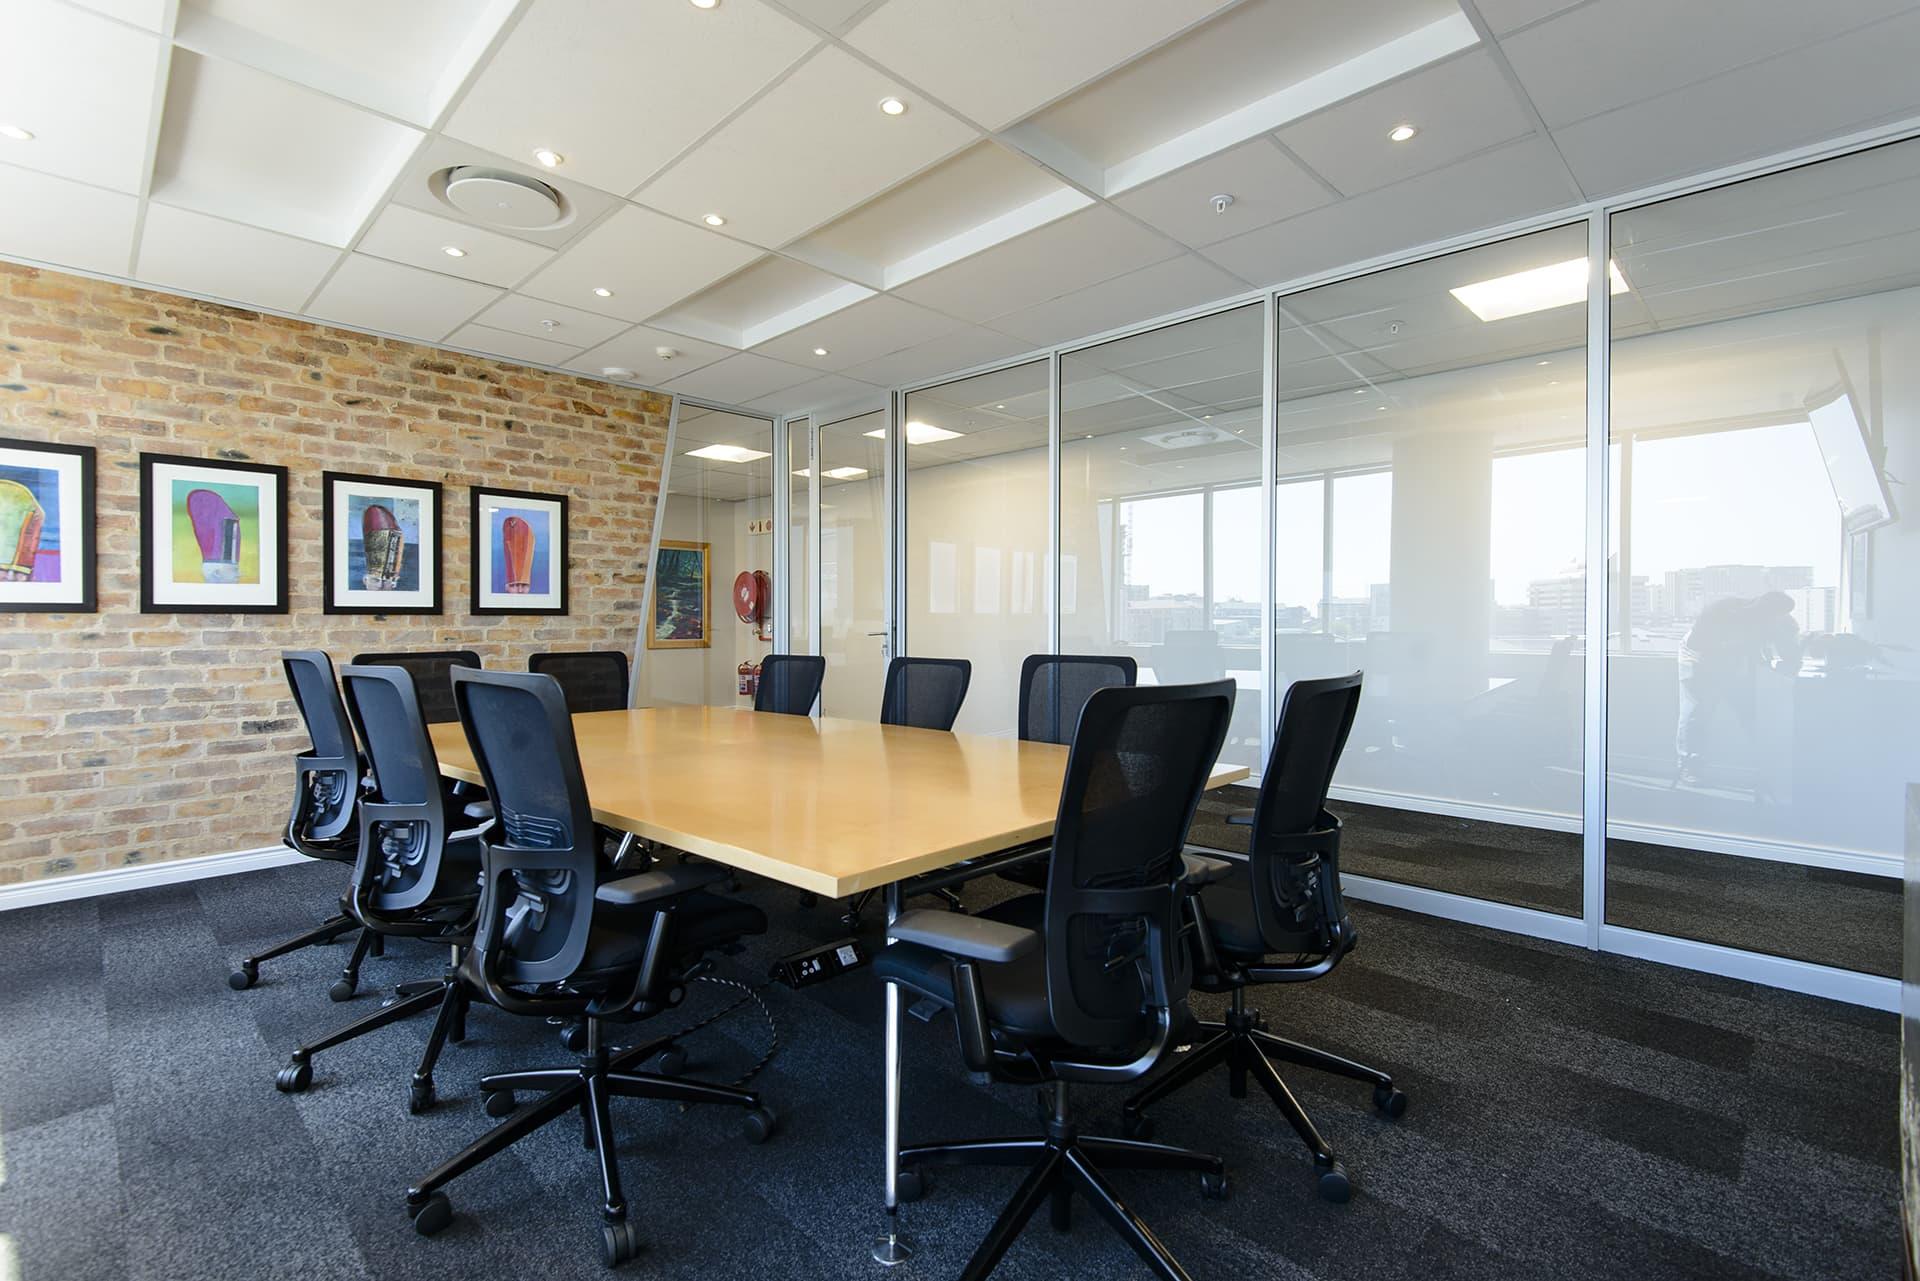 Rand Merchant Bank - Turnkey Interiors - Corporate Interior Design and Build